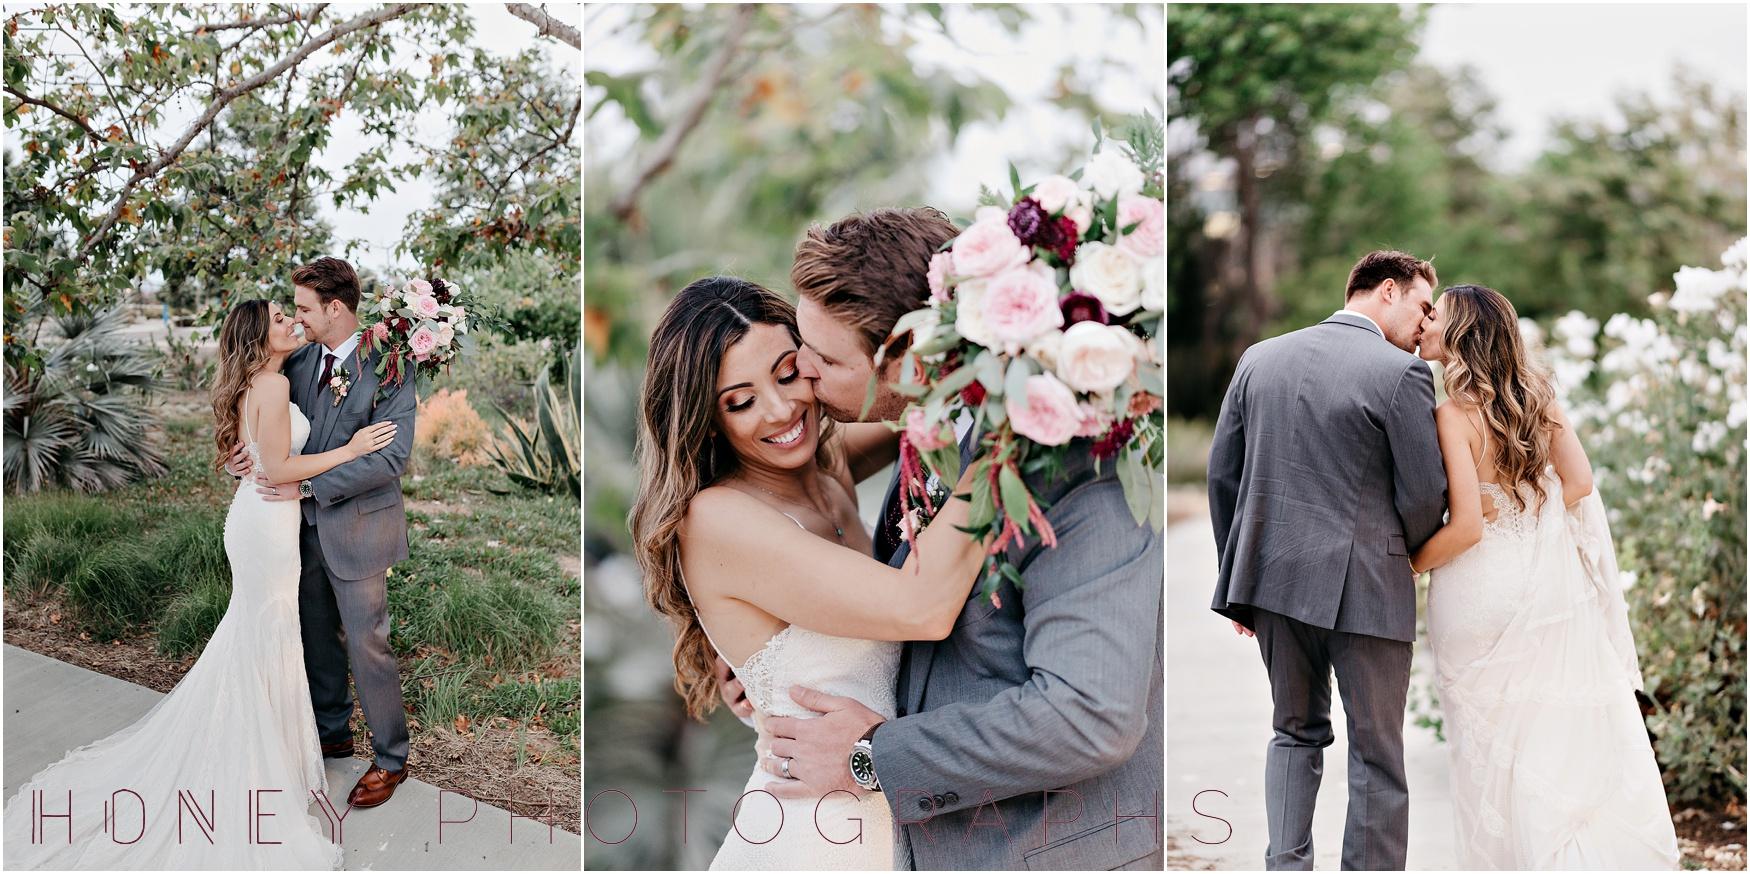 garden-classic-burgundy-jewel-tone-luxury-pacific-event-oceanside-wedding43.jpg